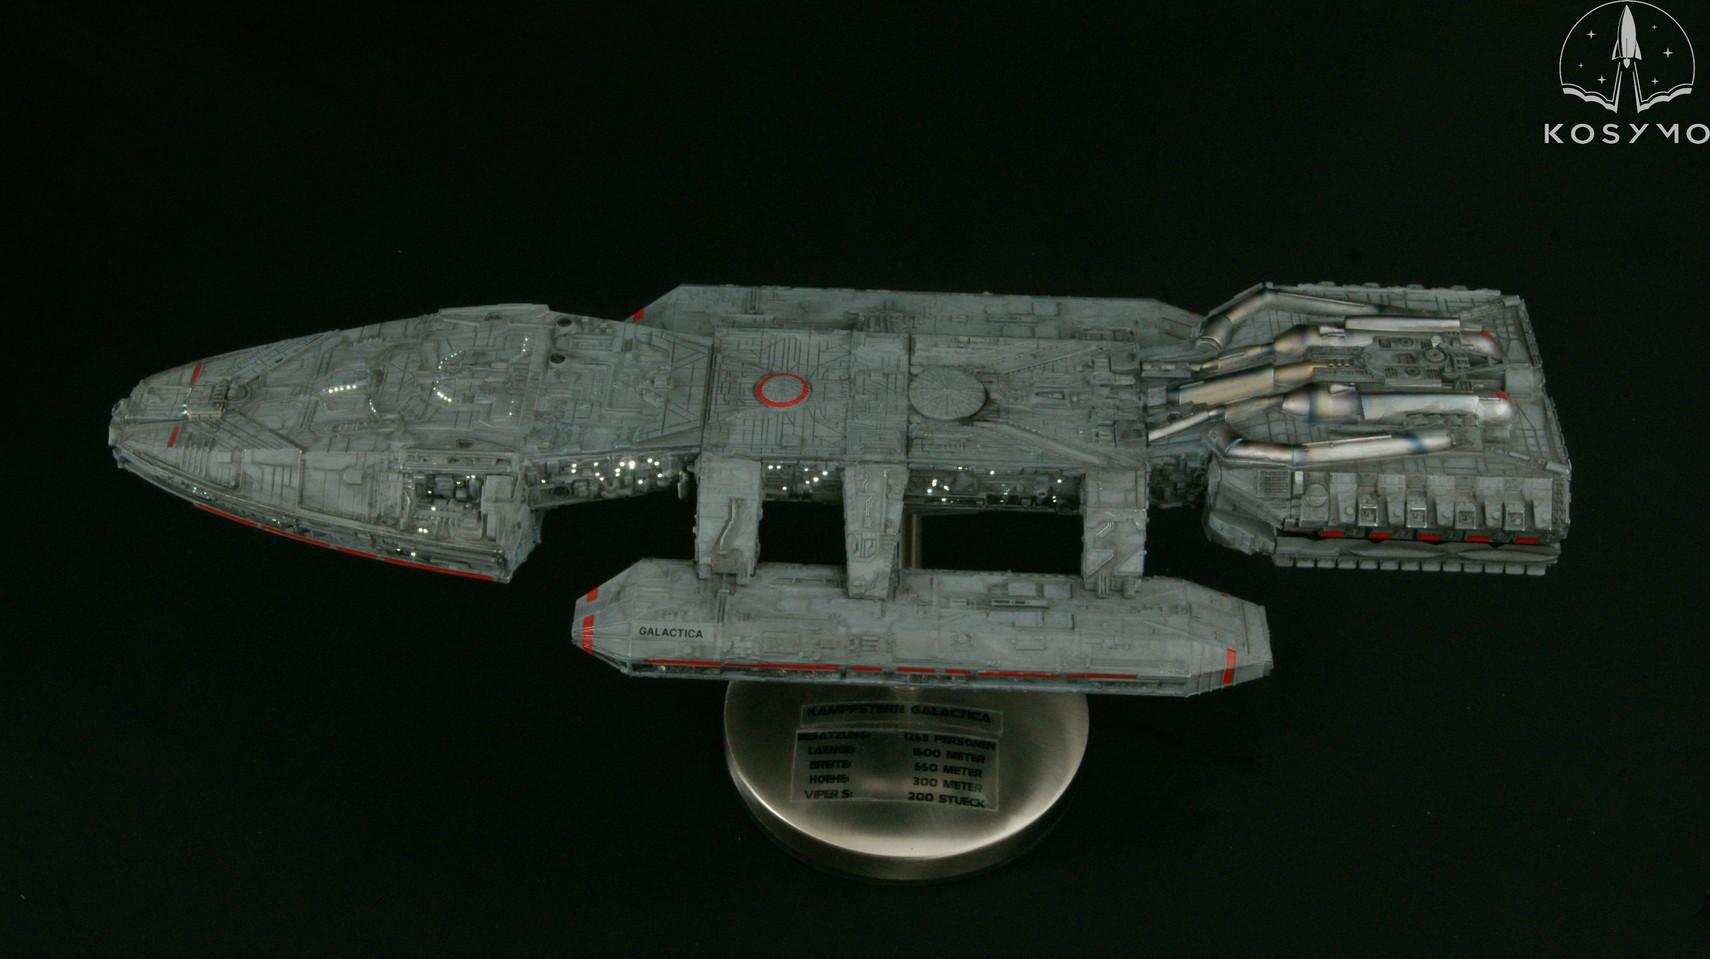 Galactica_033.JPG